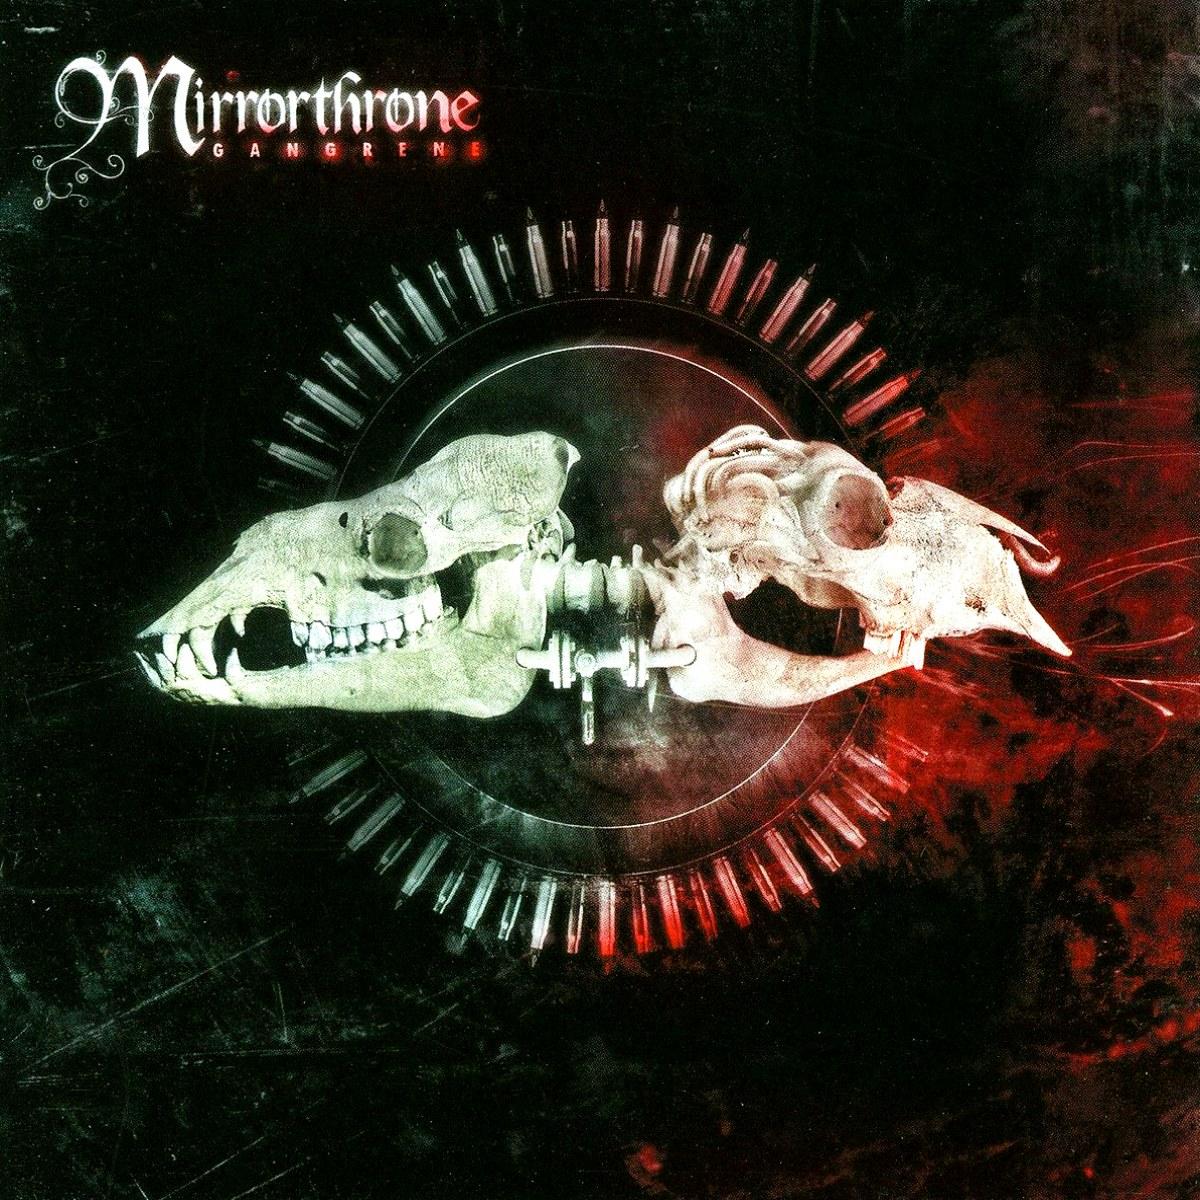 Review for Mirrorthrone - Gangrene